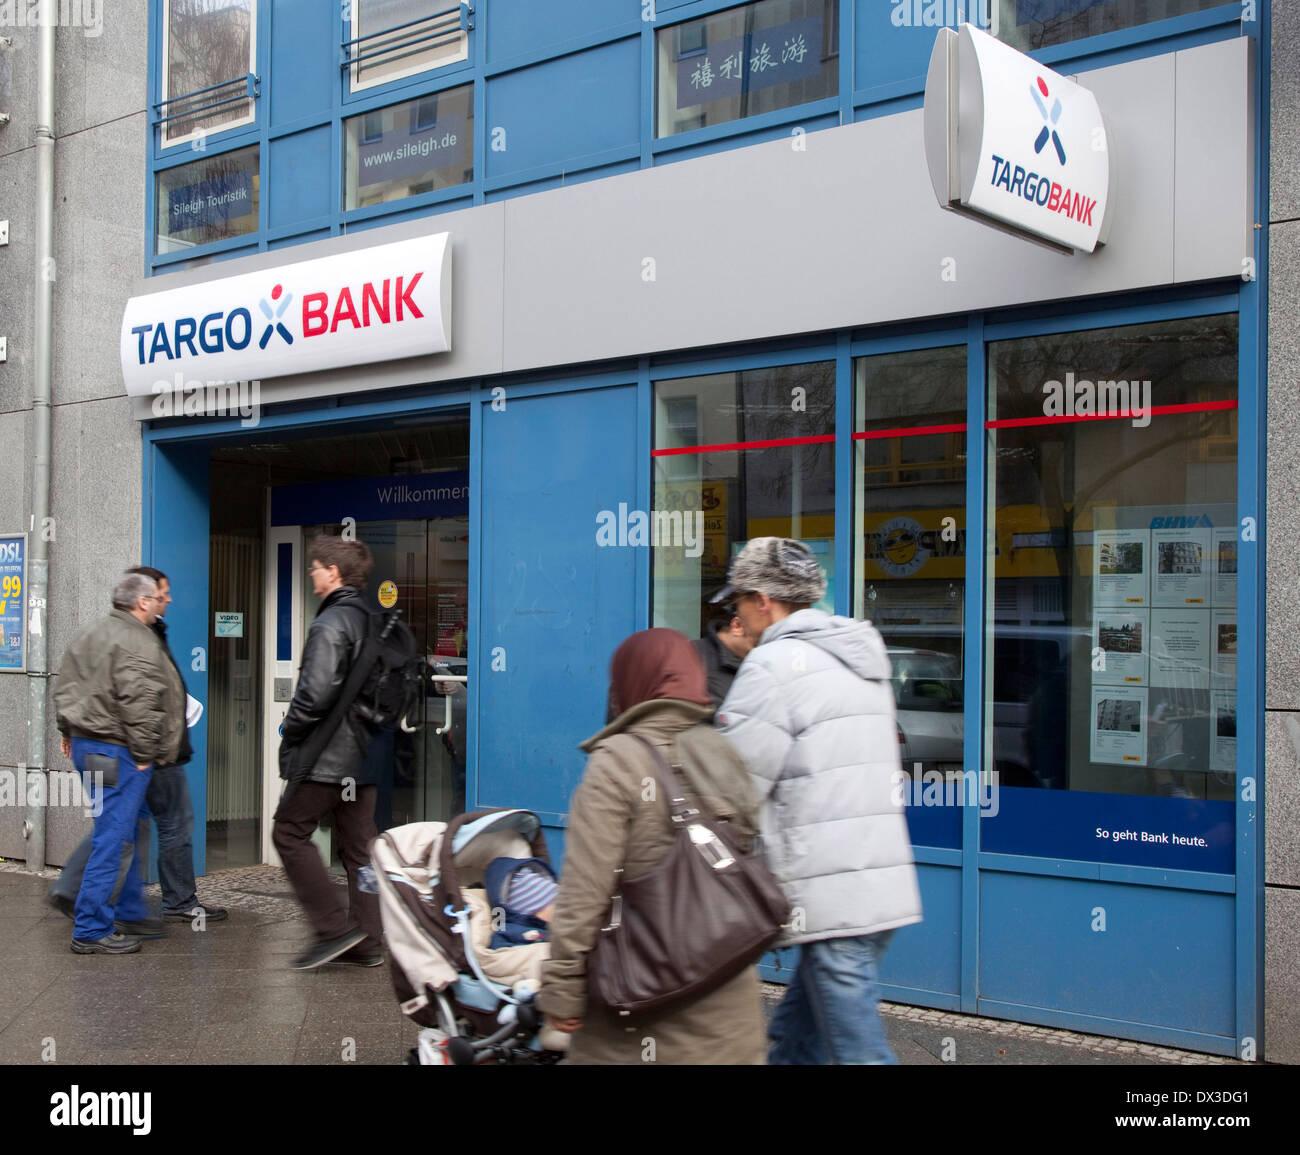 Branch TARGOBANK - Stock Image